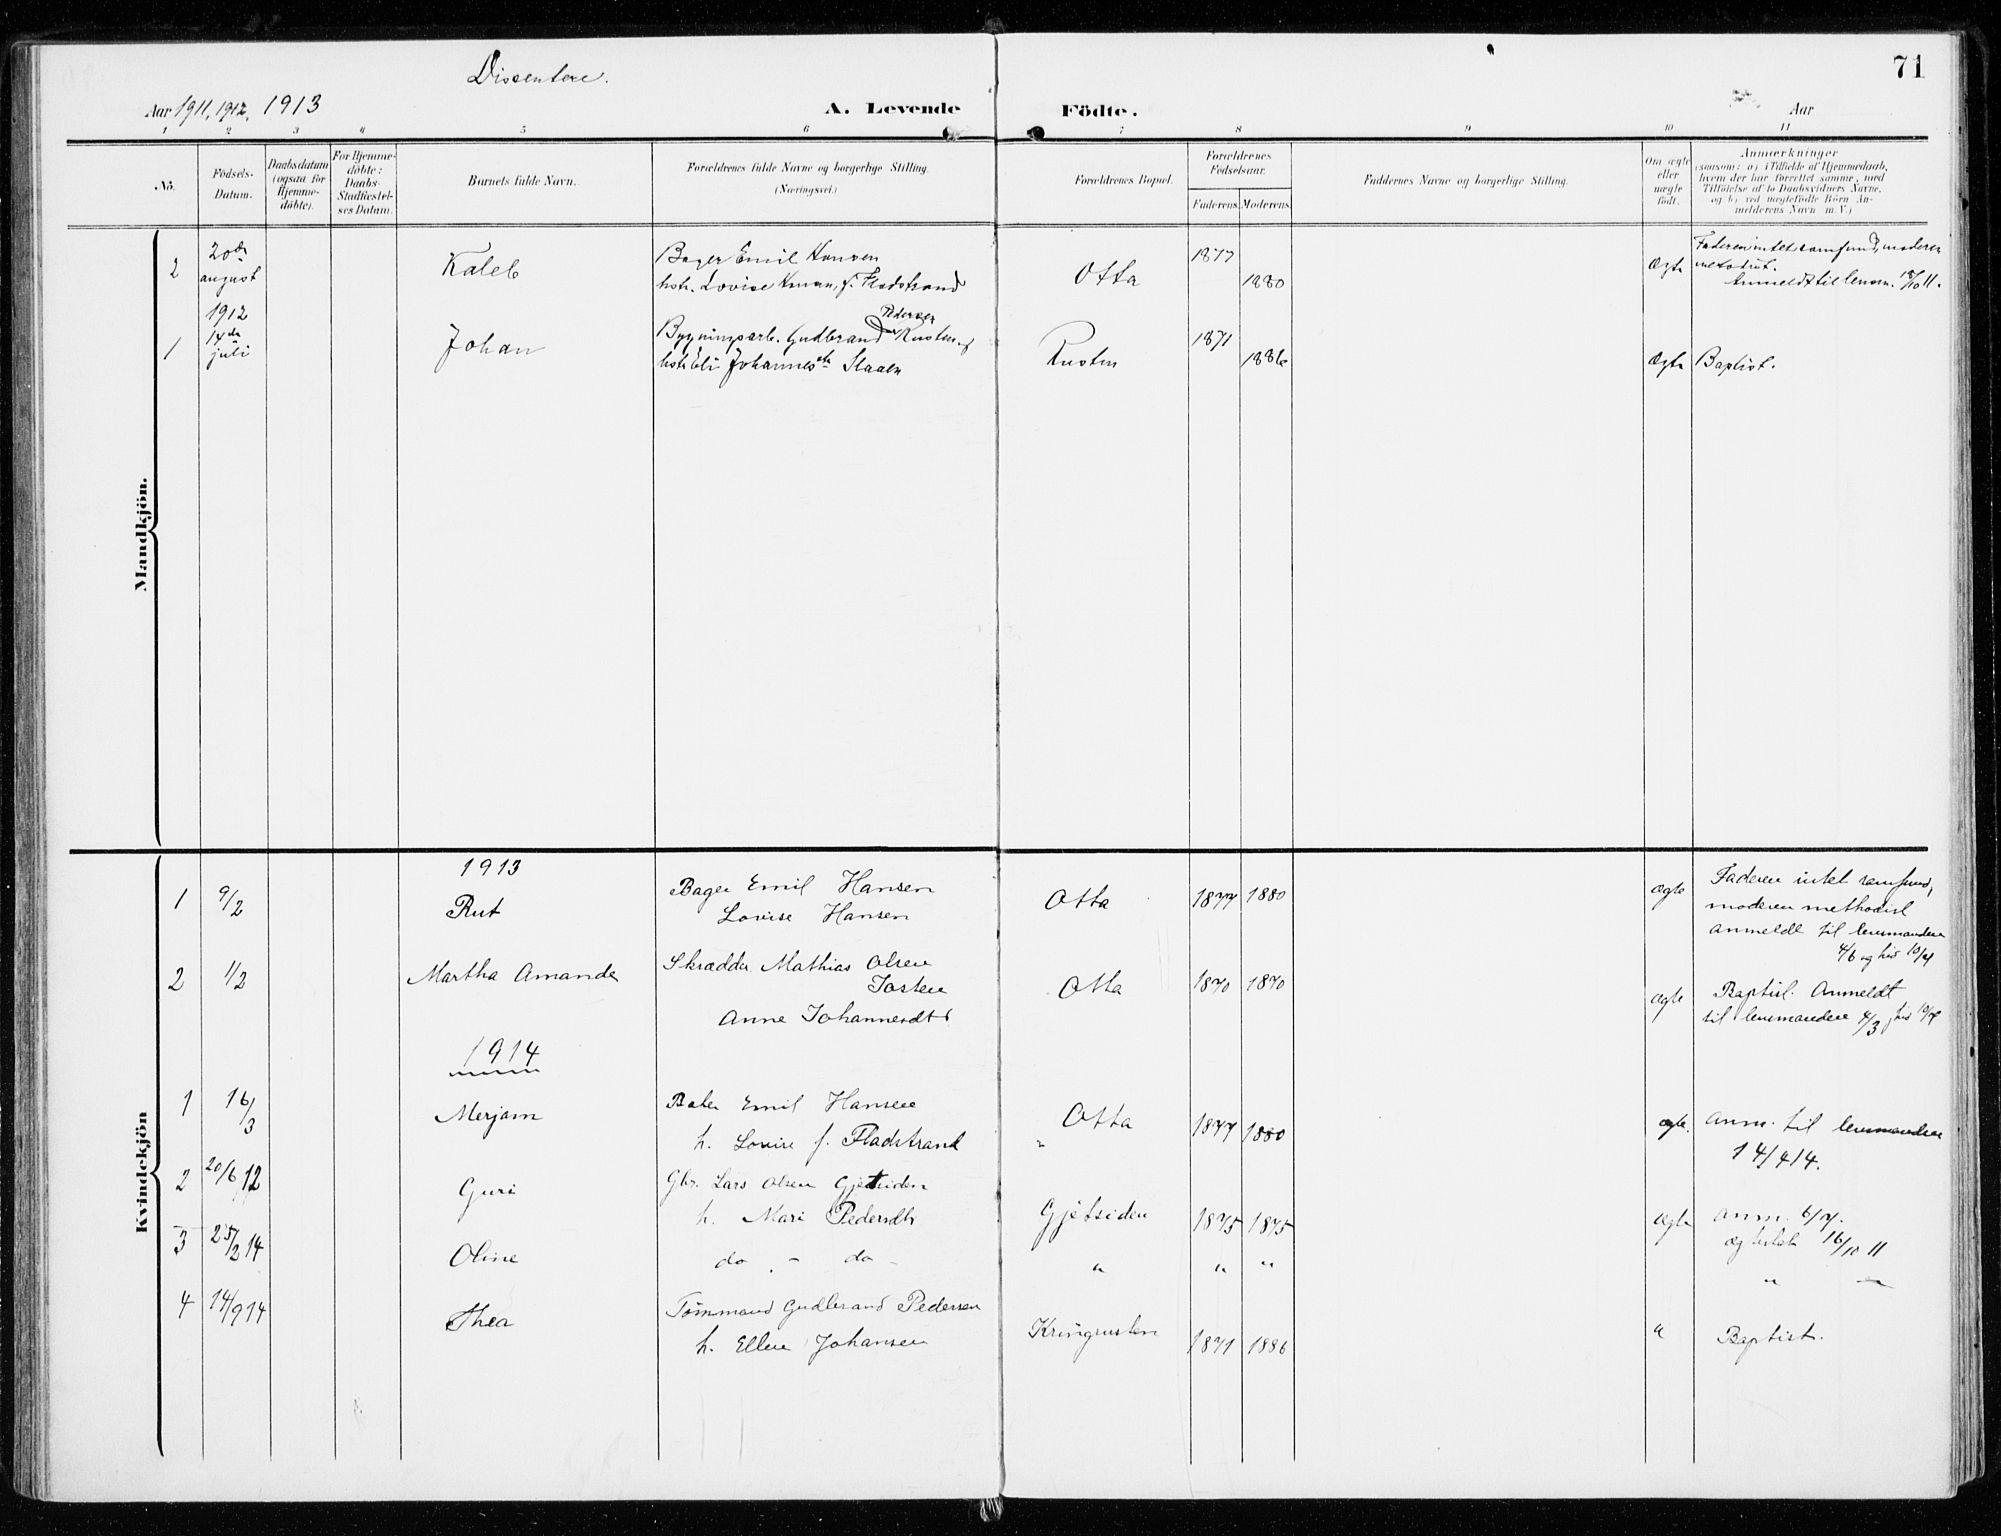 SAH, Sel prestekontor, Ministerialbok nr. 2, 1905-1919, s. 71